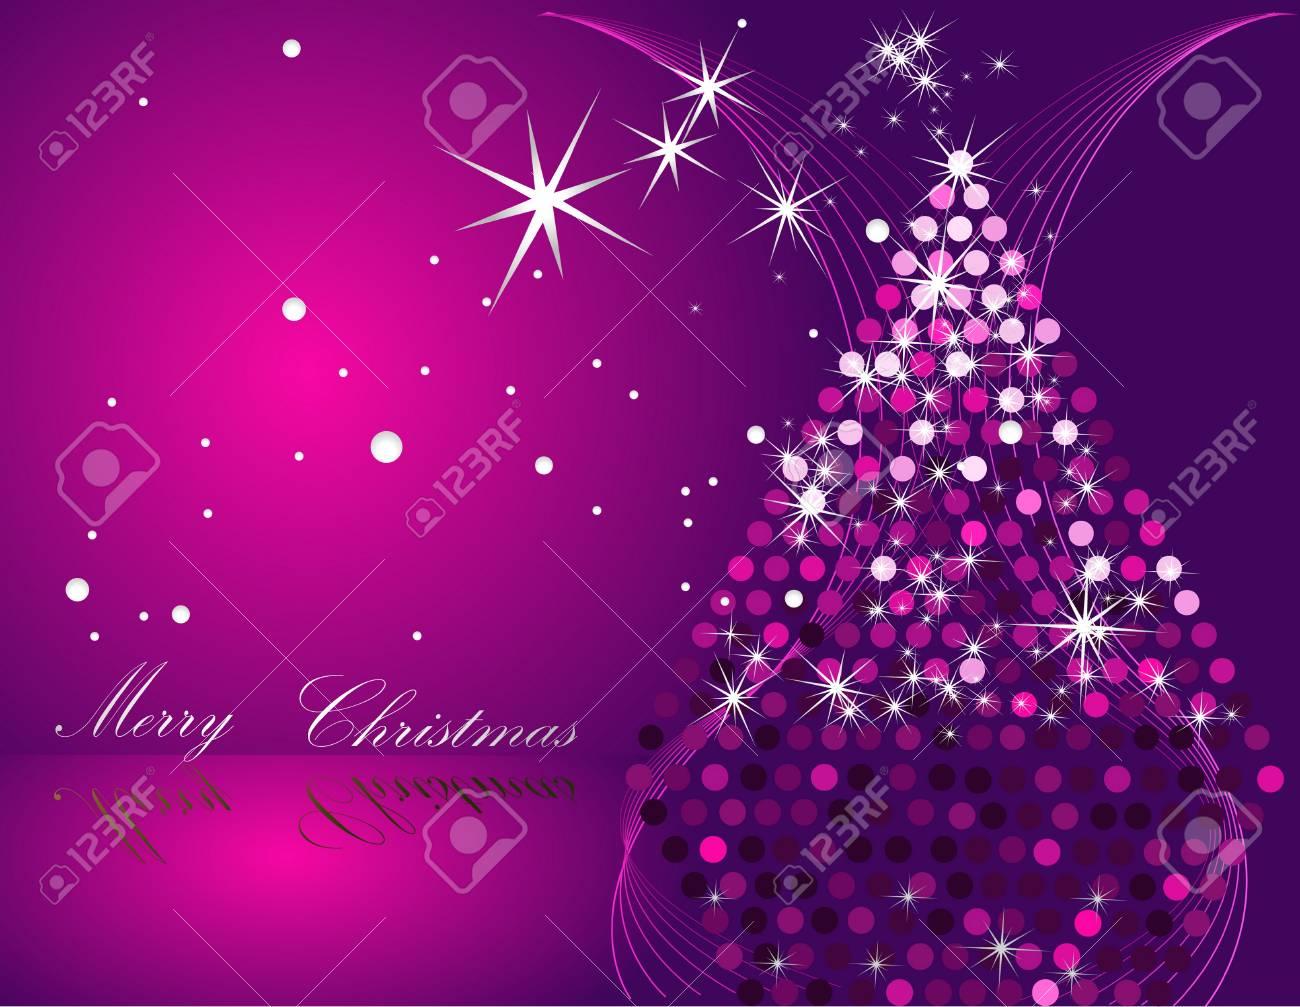 Albero Di Natale Rosa.Albero Di Natale Rosa E Argento